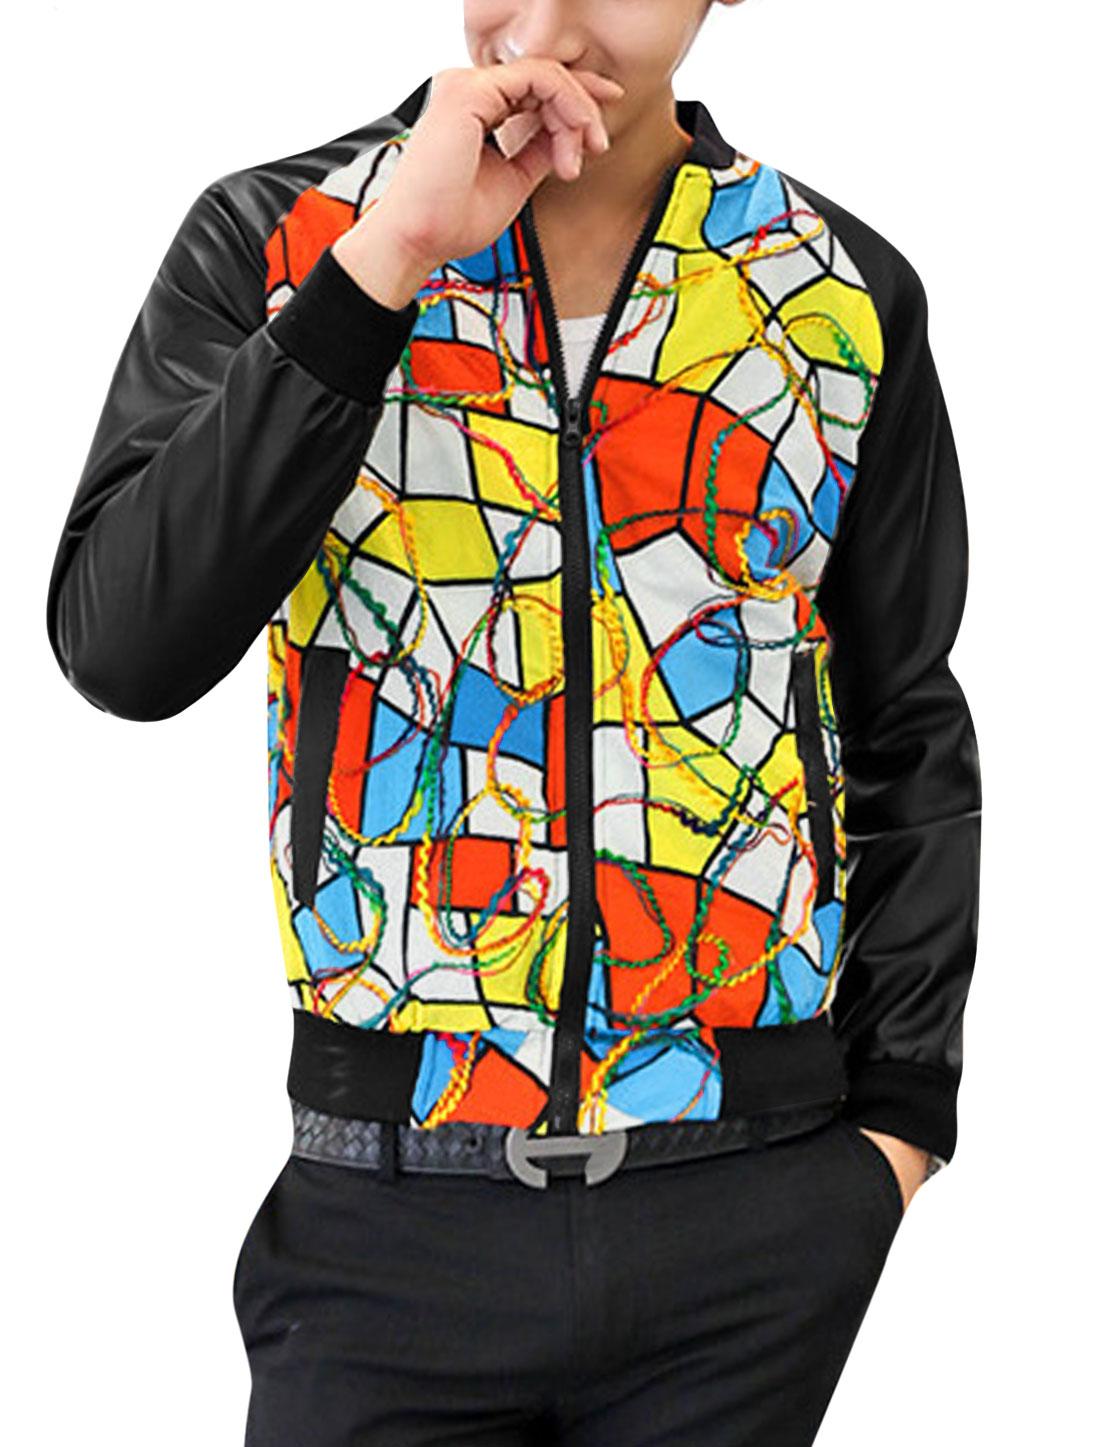 Men Imitation Leather Panel Contrast Geometric Print Fashion Jacket Multicolor M